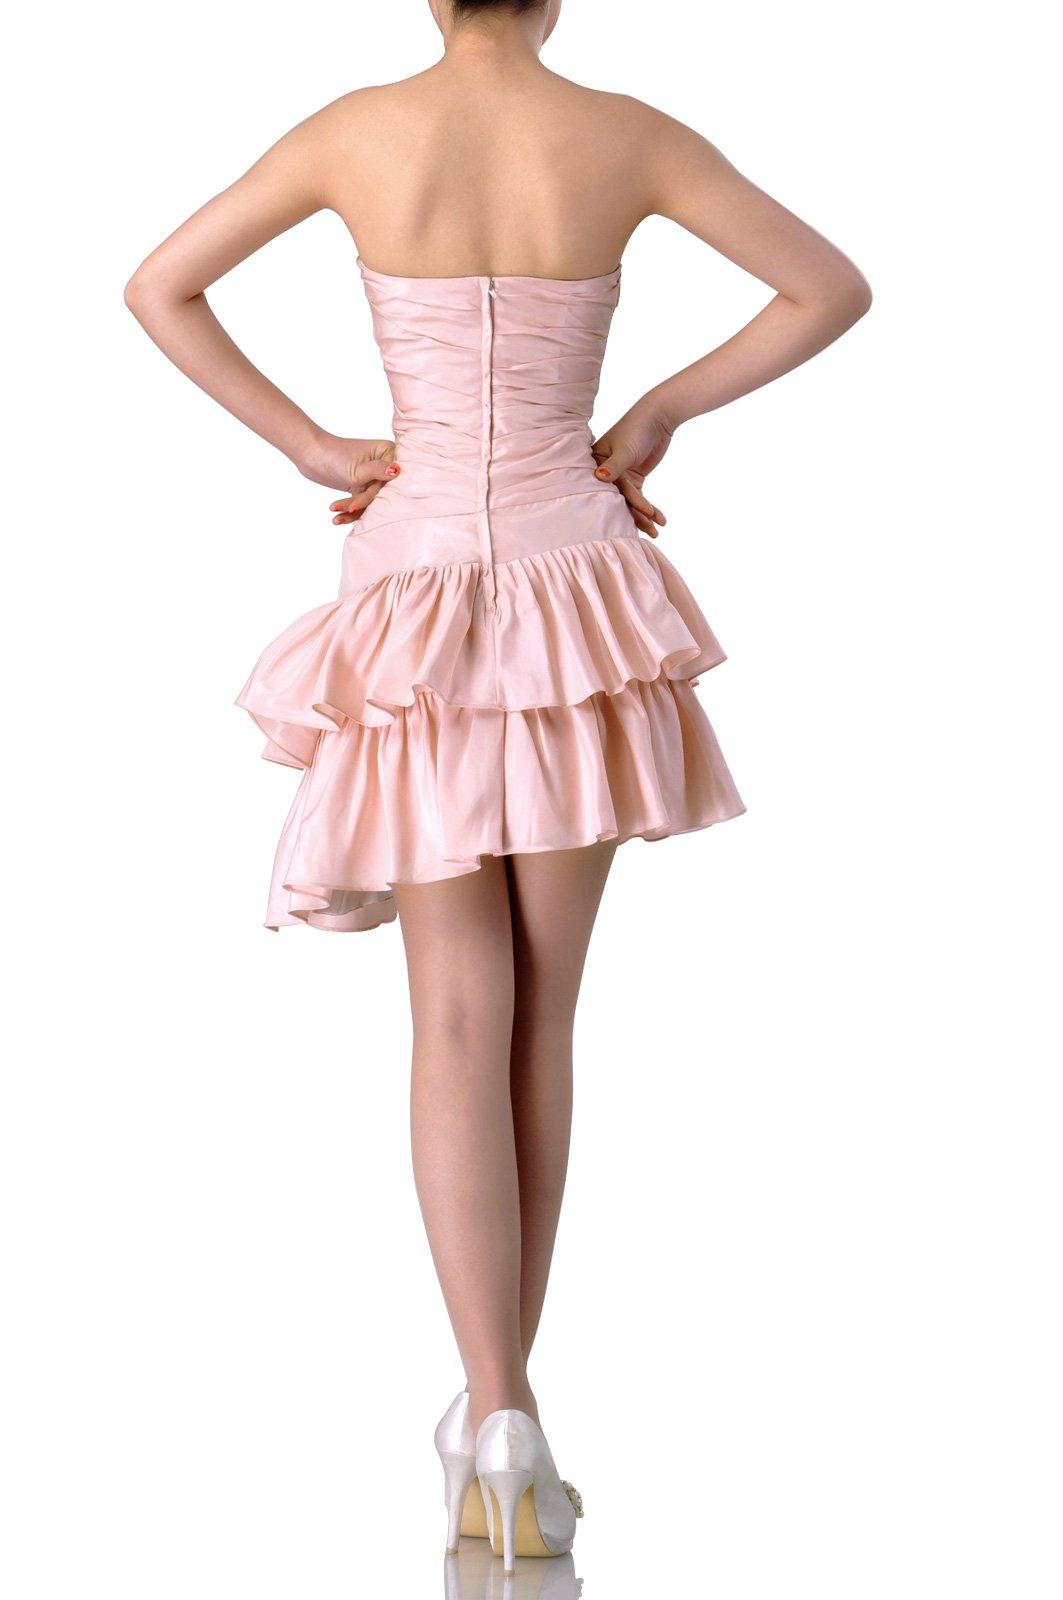 Taffeta Natrual Bateau Short Strapless Homecoming Modest Bridesmaid Dress Short, Color White,14 by Adorona (Image #3)